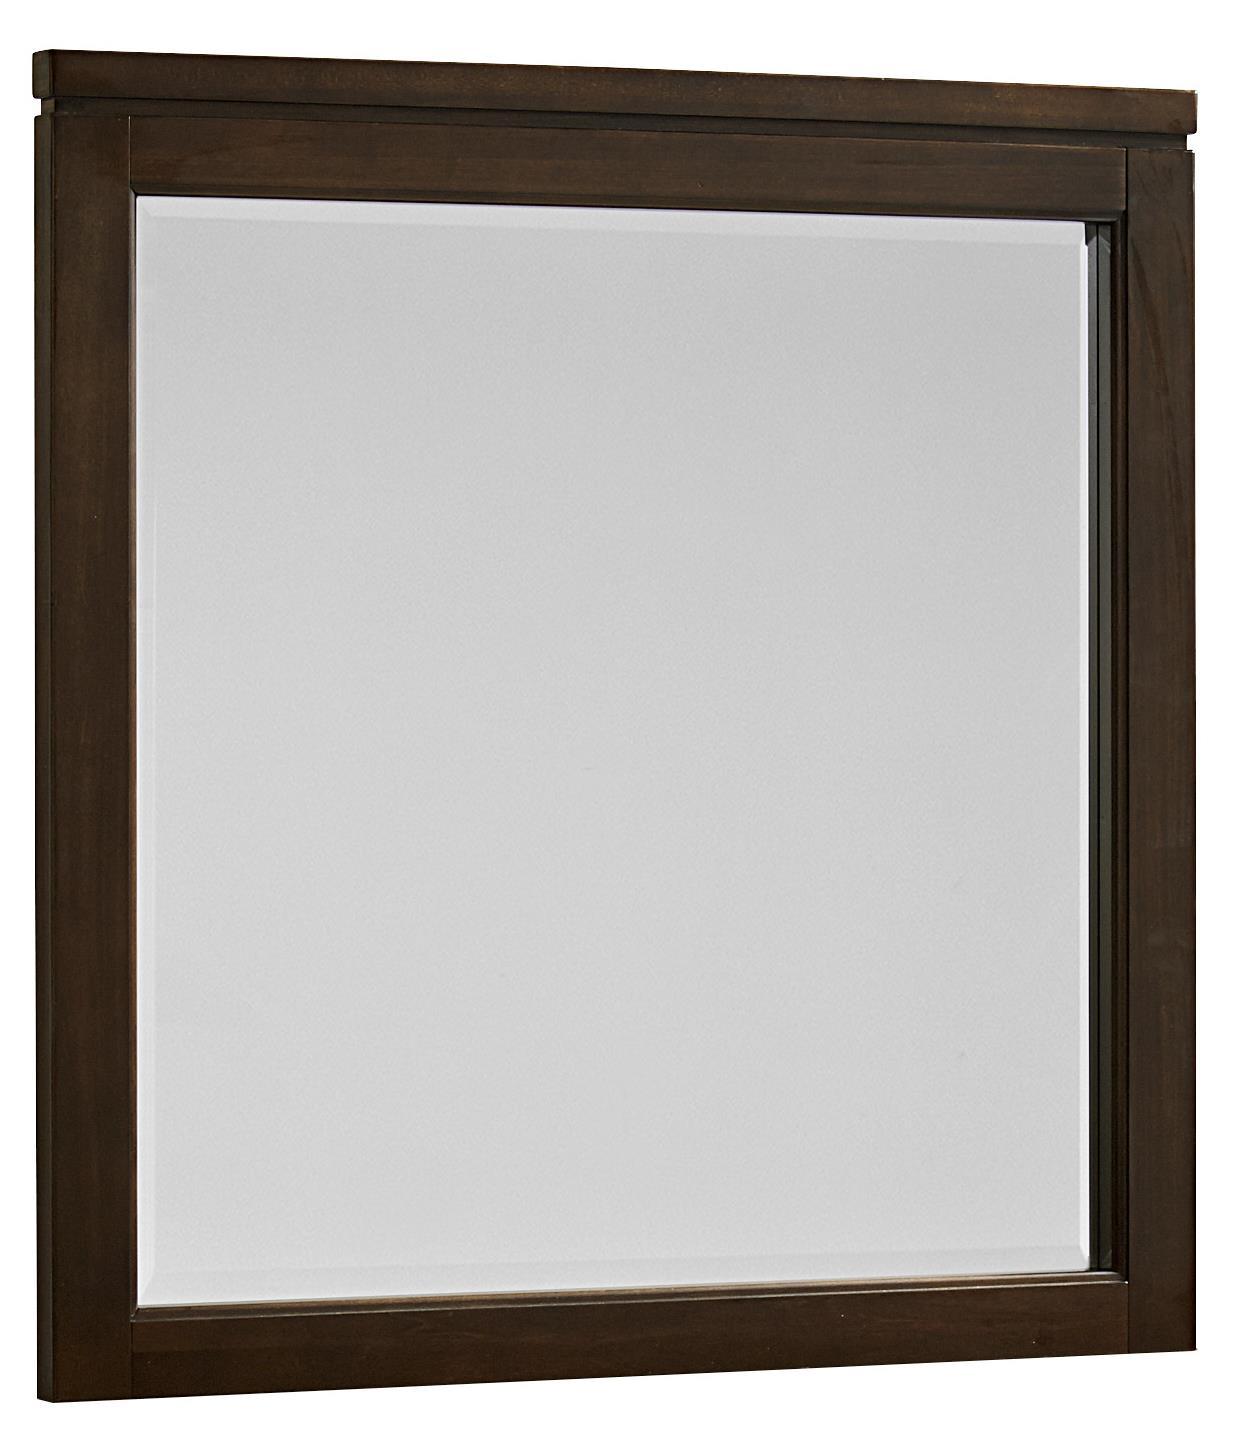 Vaughan Bassett Kismet Landscape Mirror - Item Number: 410-446